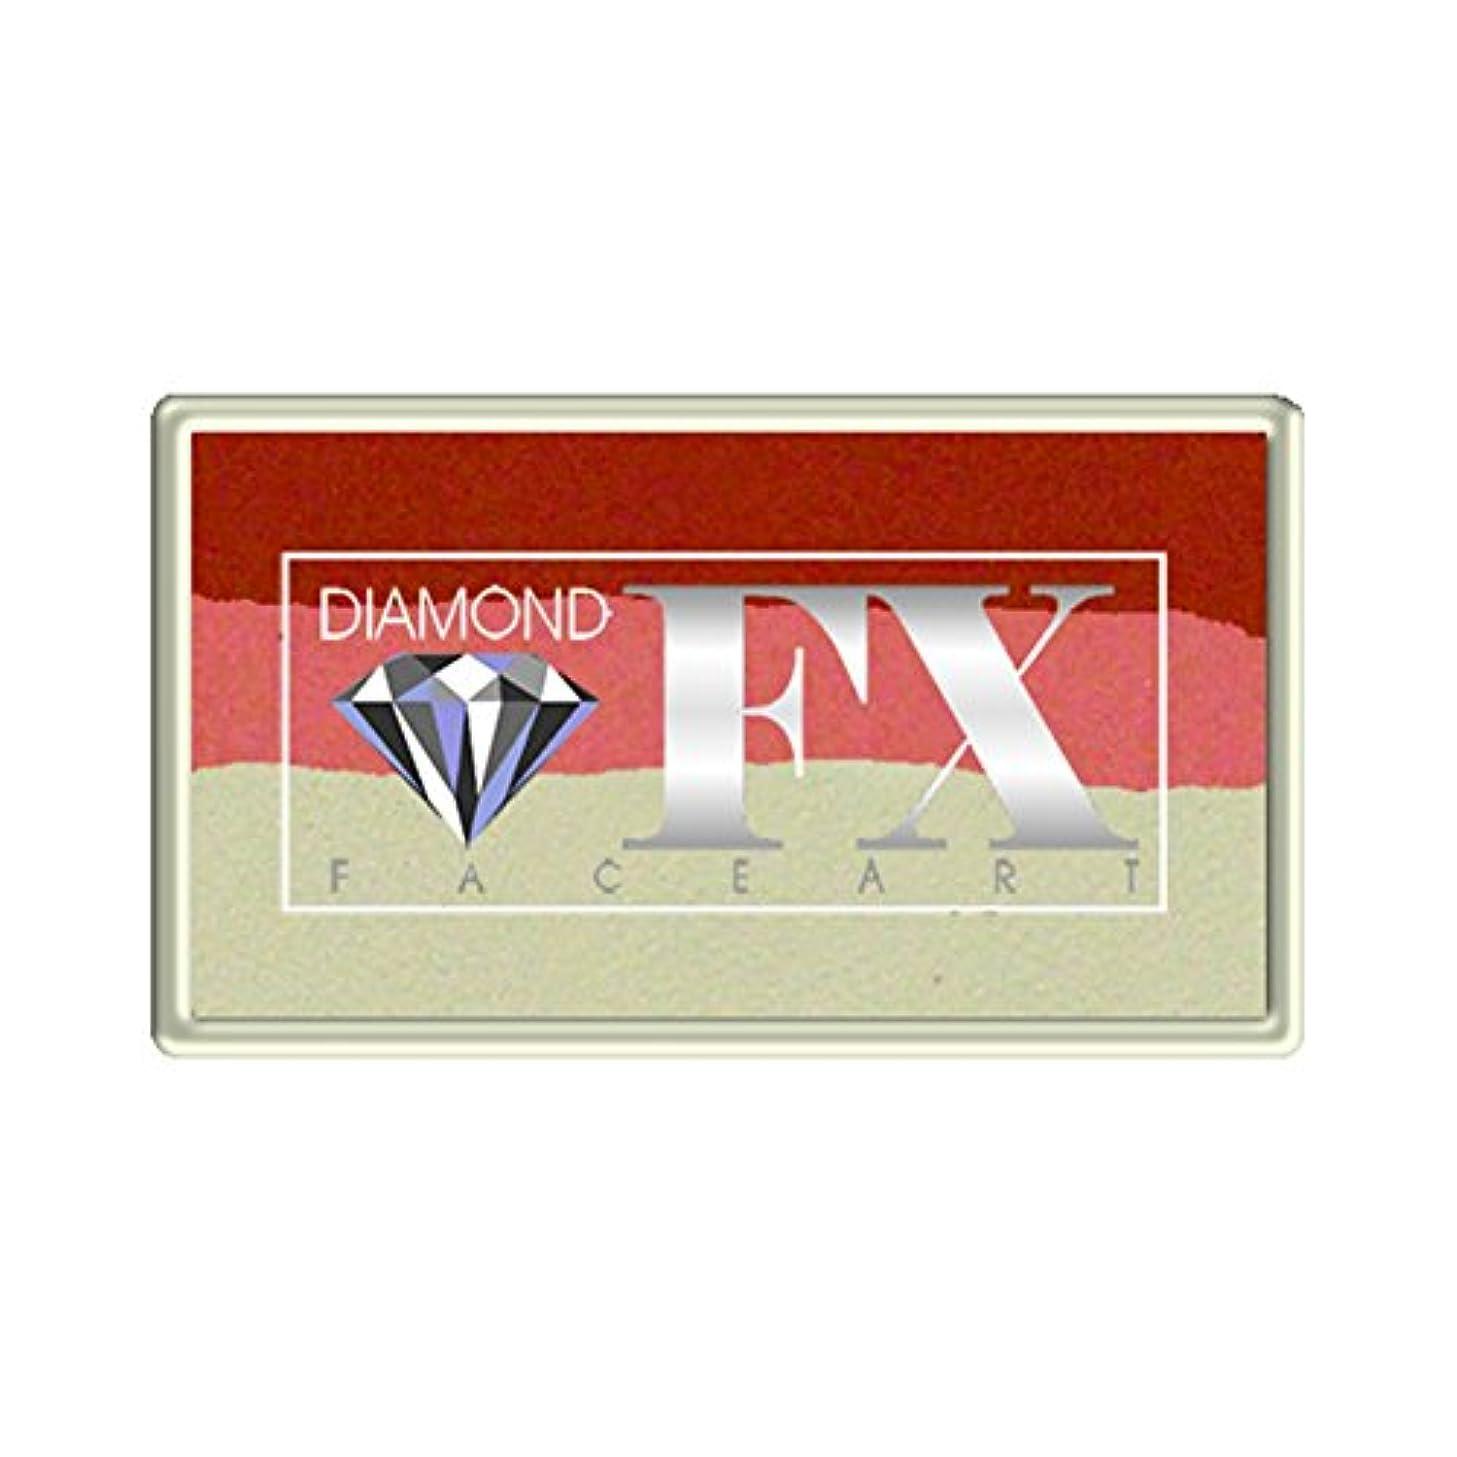 Diamond FX Split Cake, 28 gm - Small Strawberry Delight